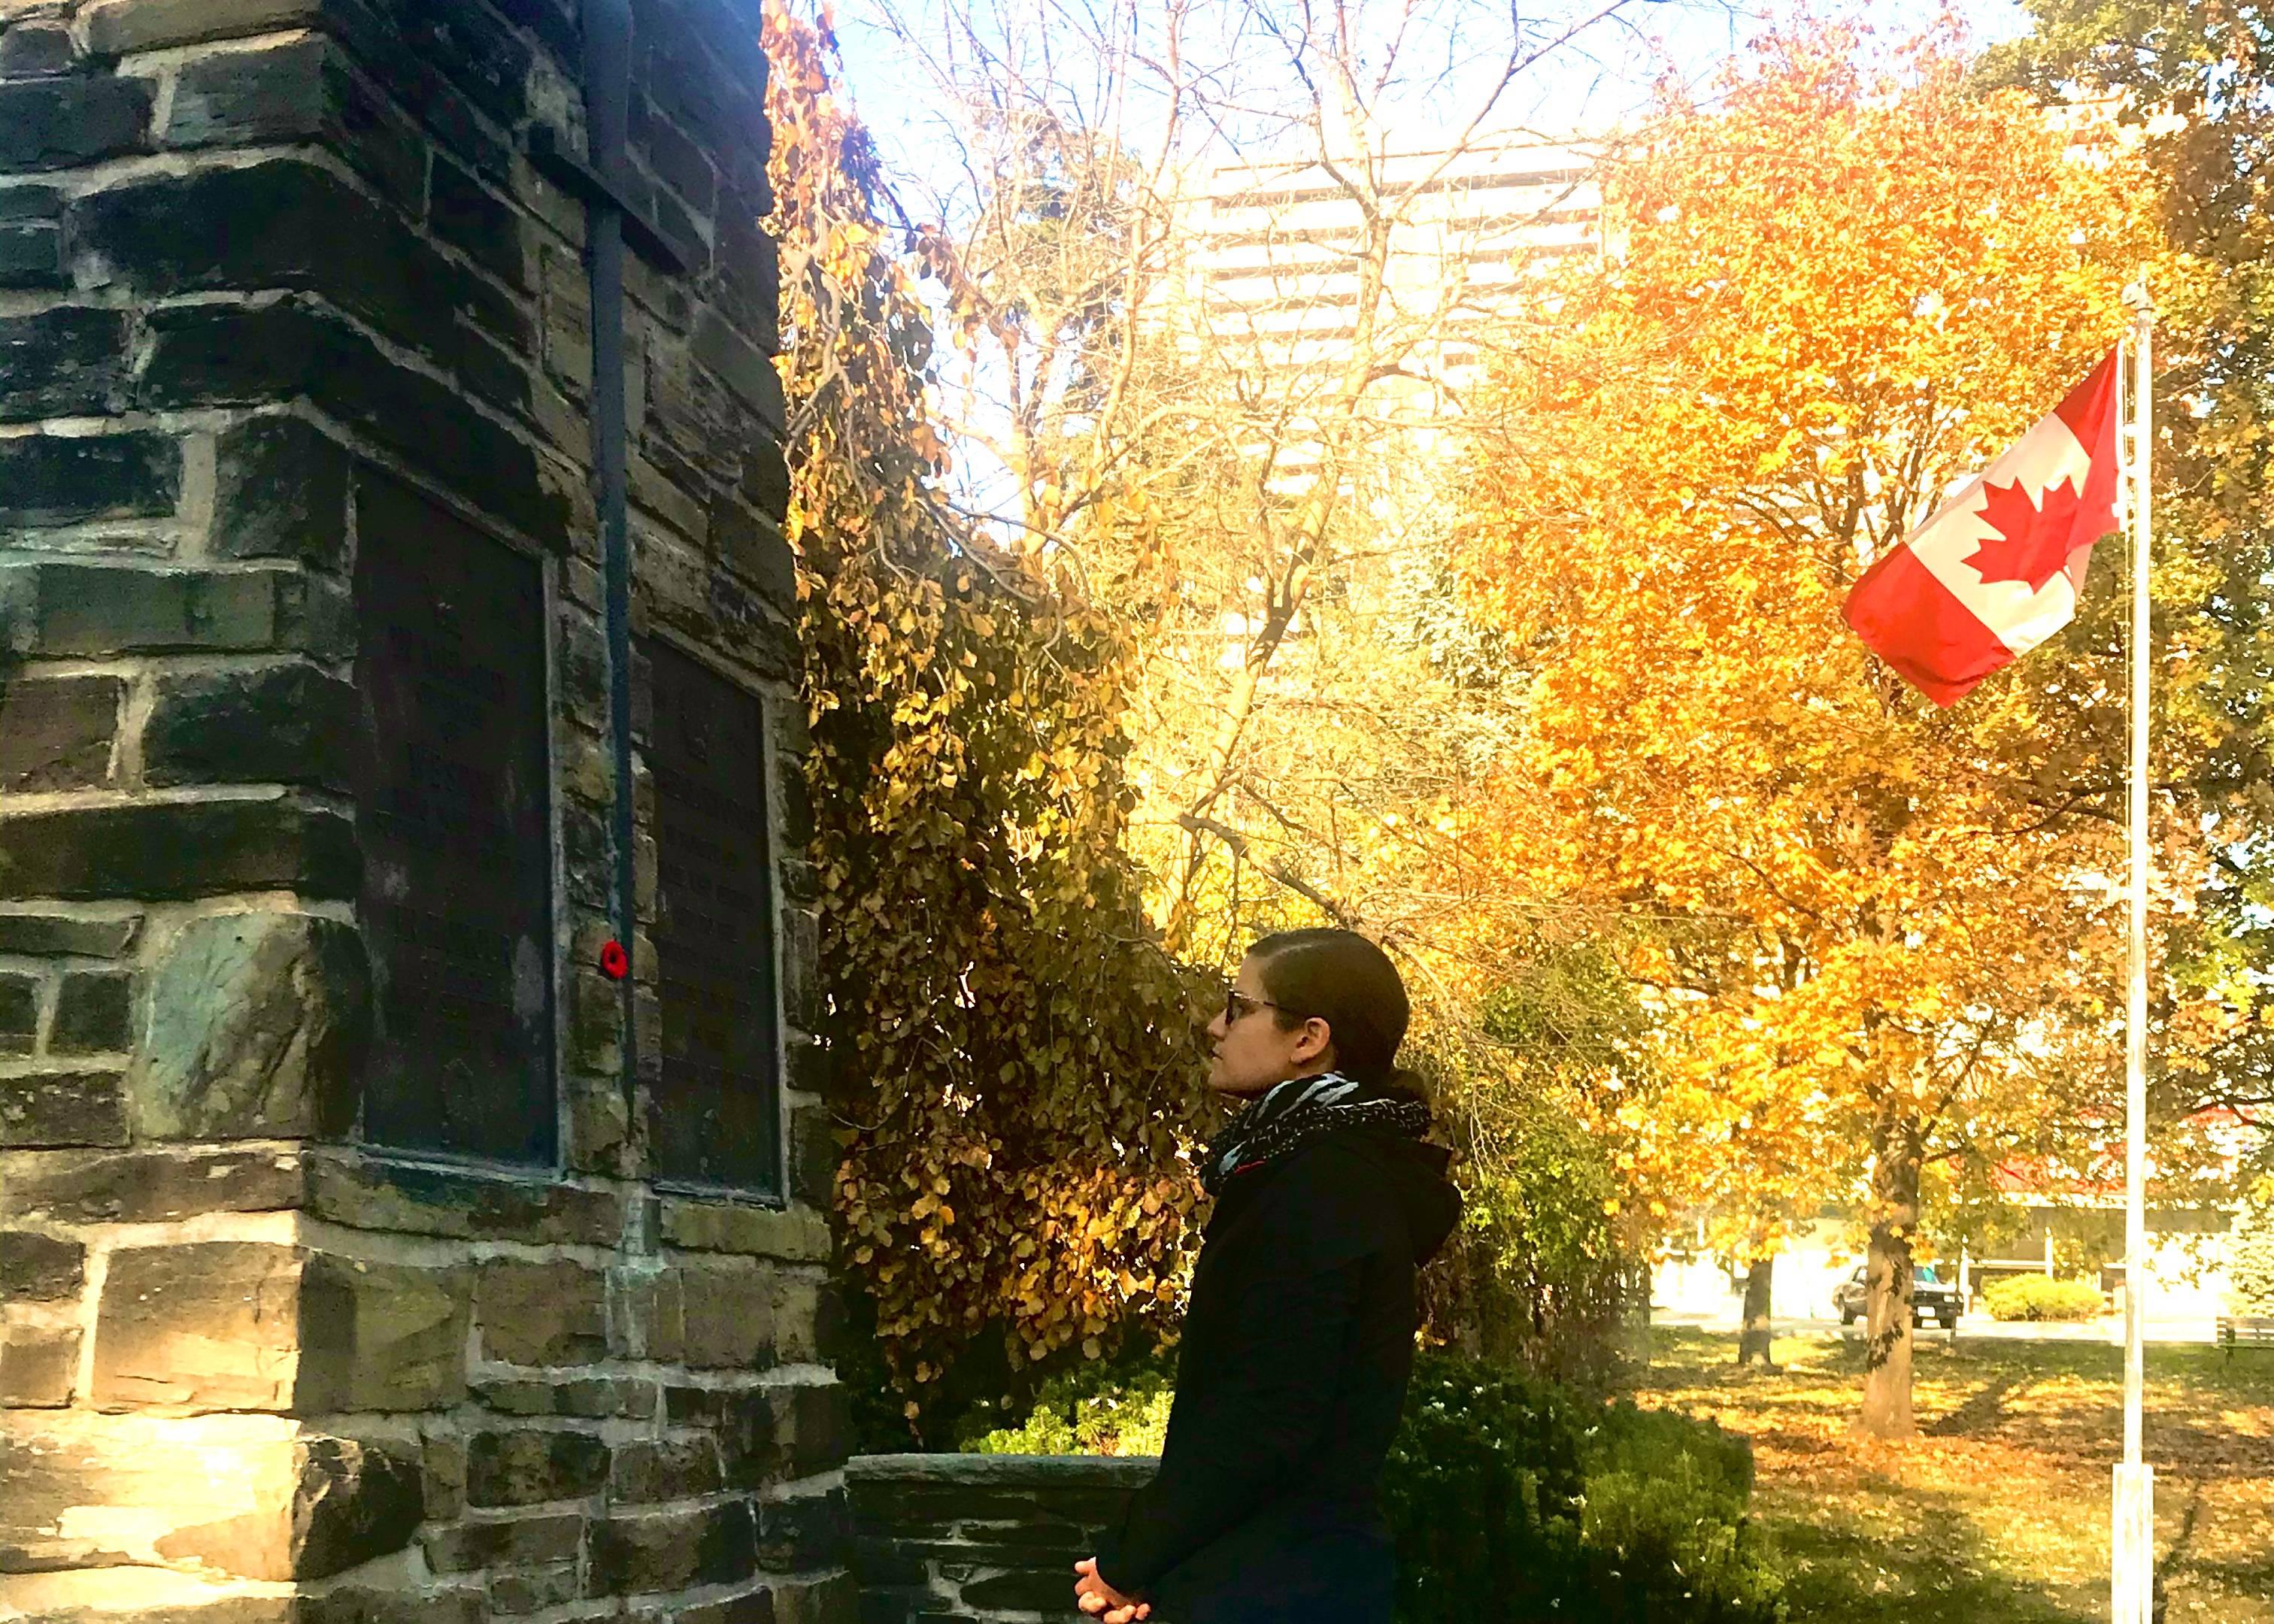 Chiara Padovani stands at the Weston Cenotaph